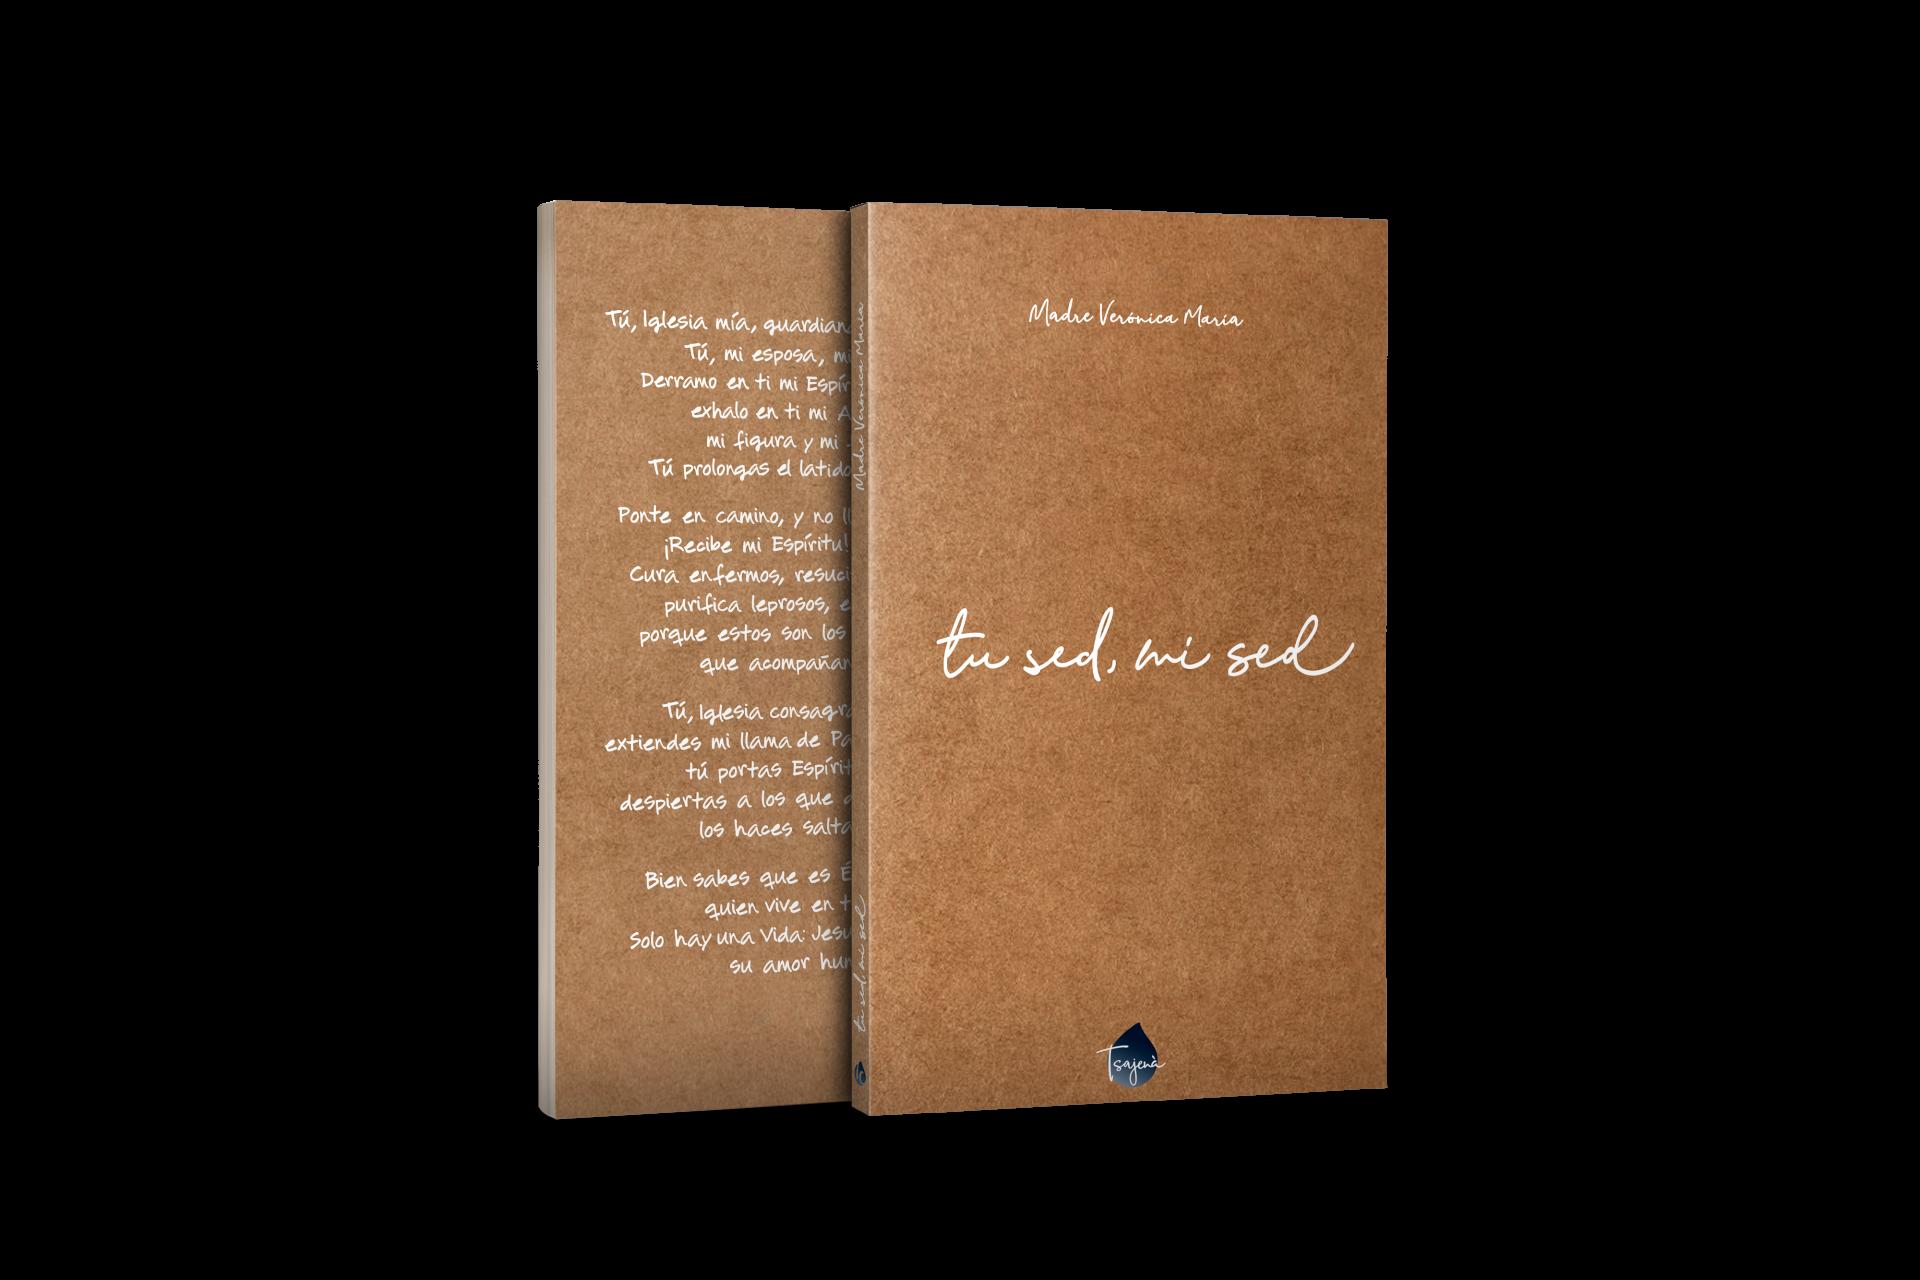 Plantilla Front-Back-Book TU SED MI SED.png